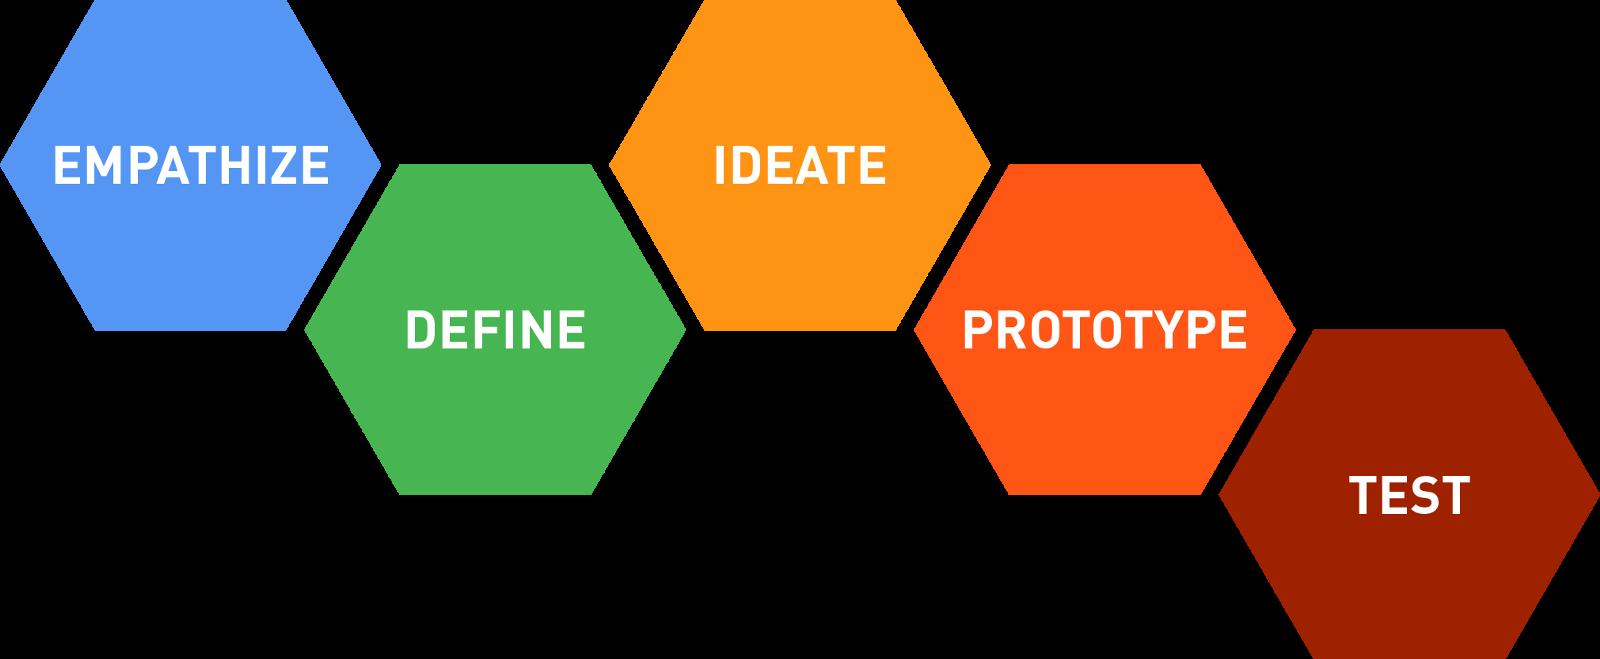 Figure 2. d.School Design Thinking